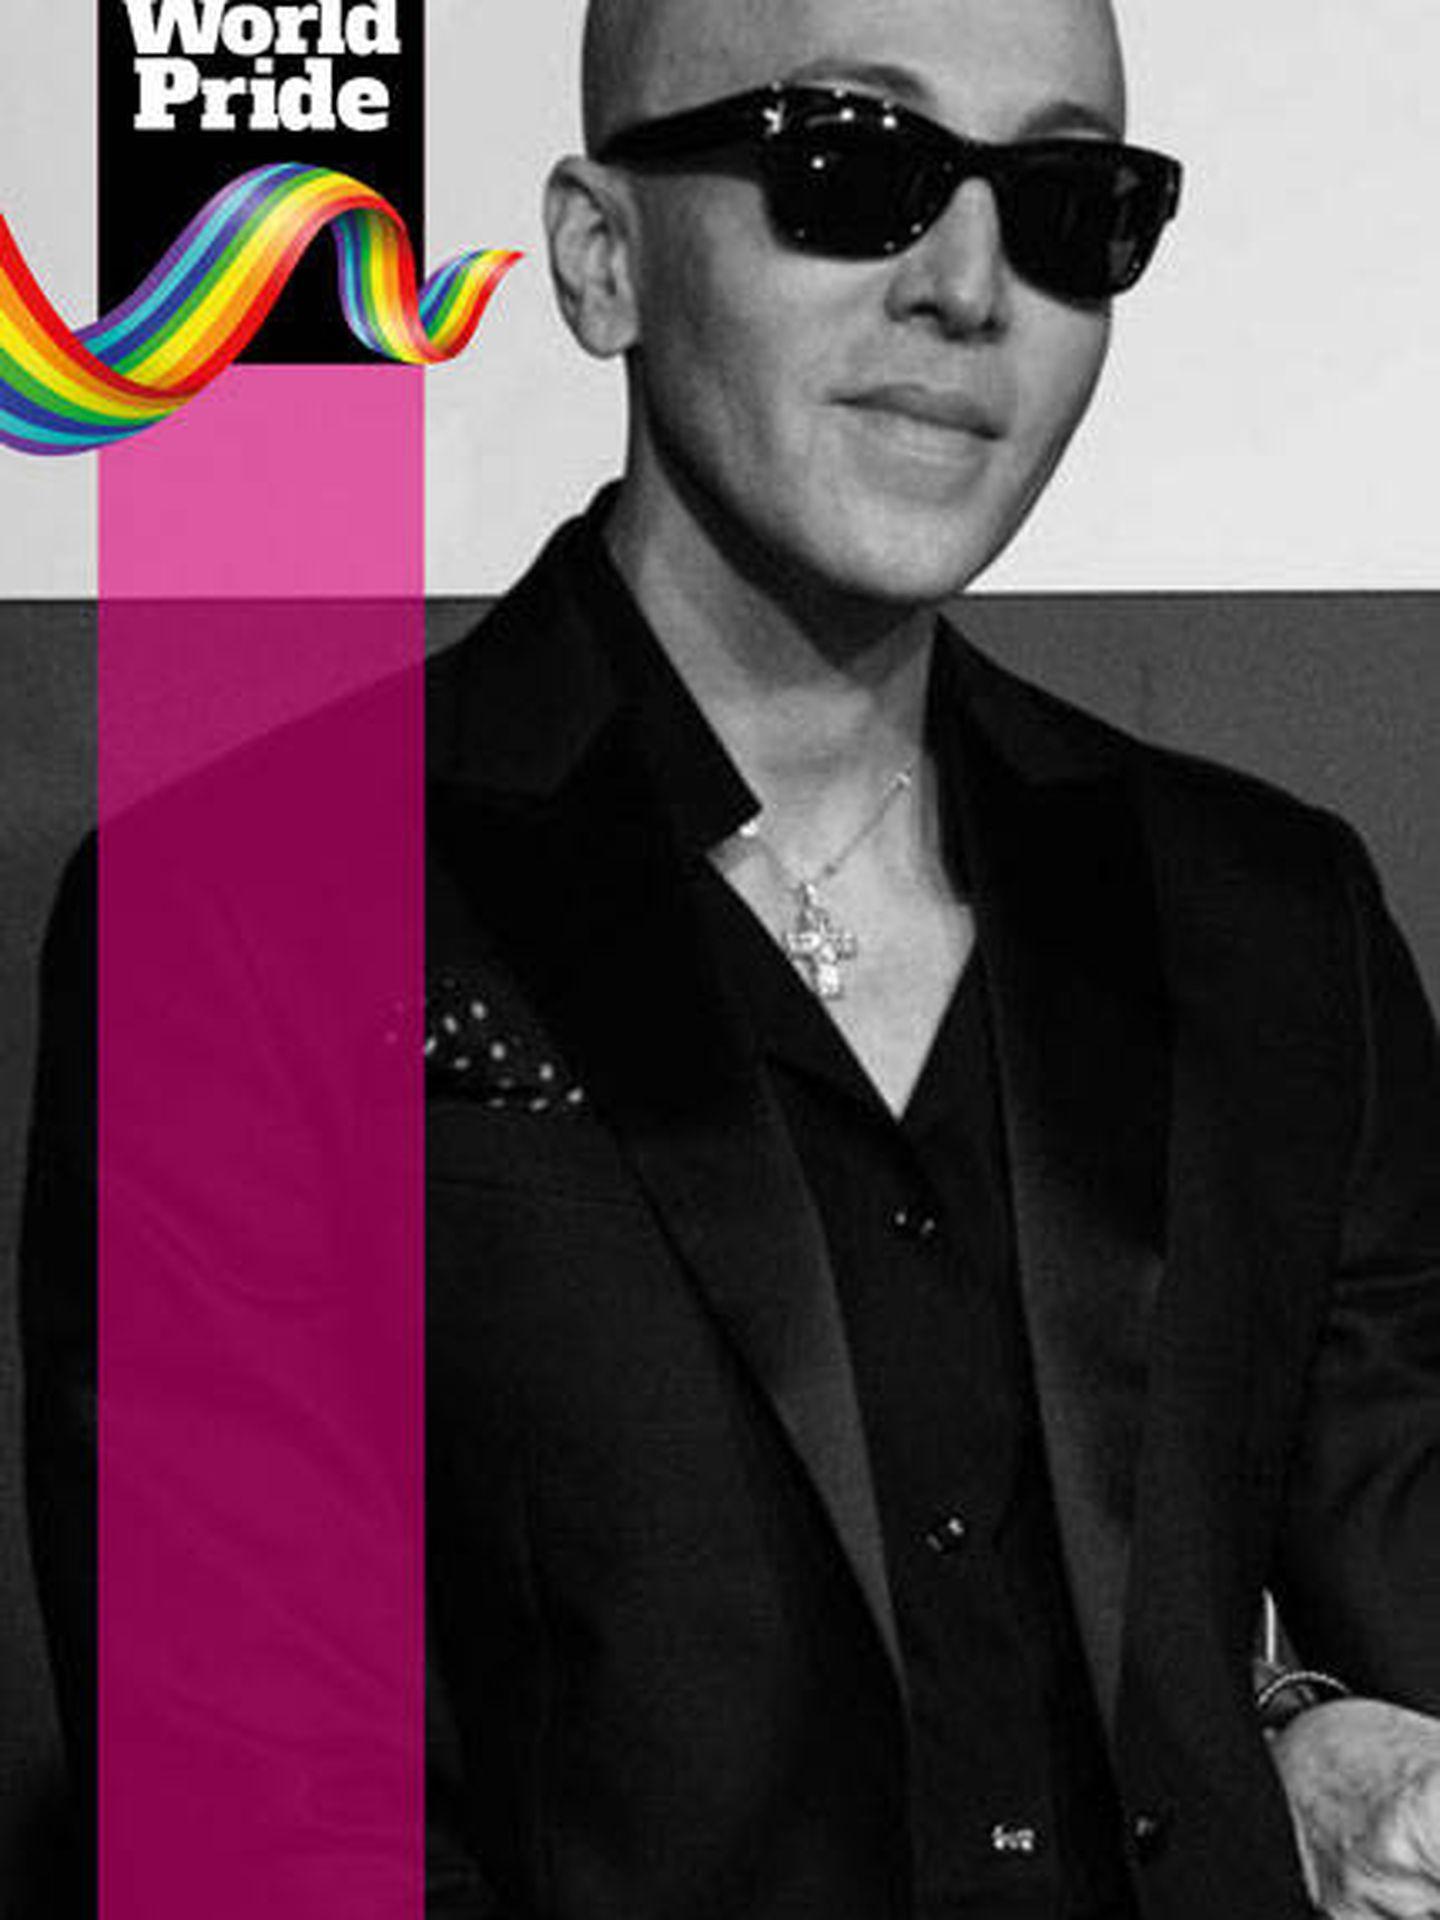 Orgullo LGTBI 2017: Felipe Varela. (Moda)